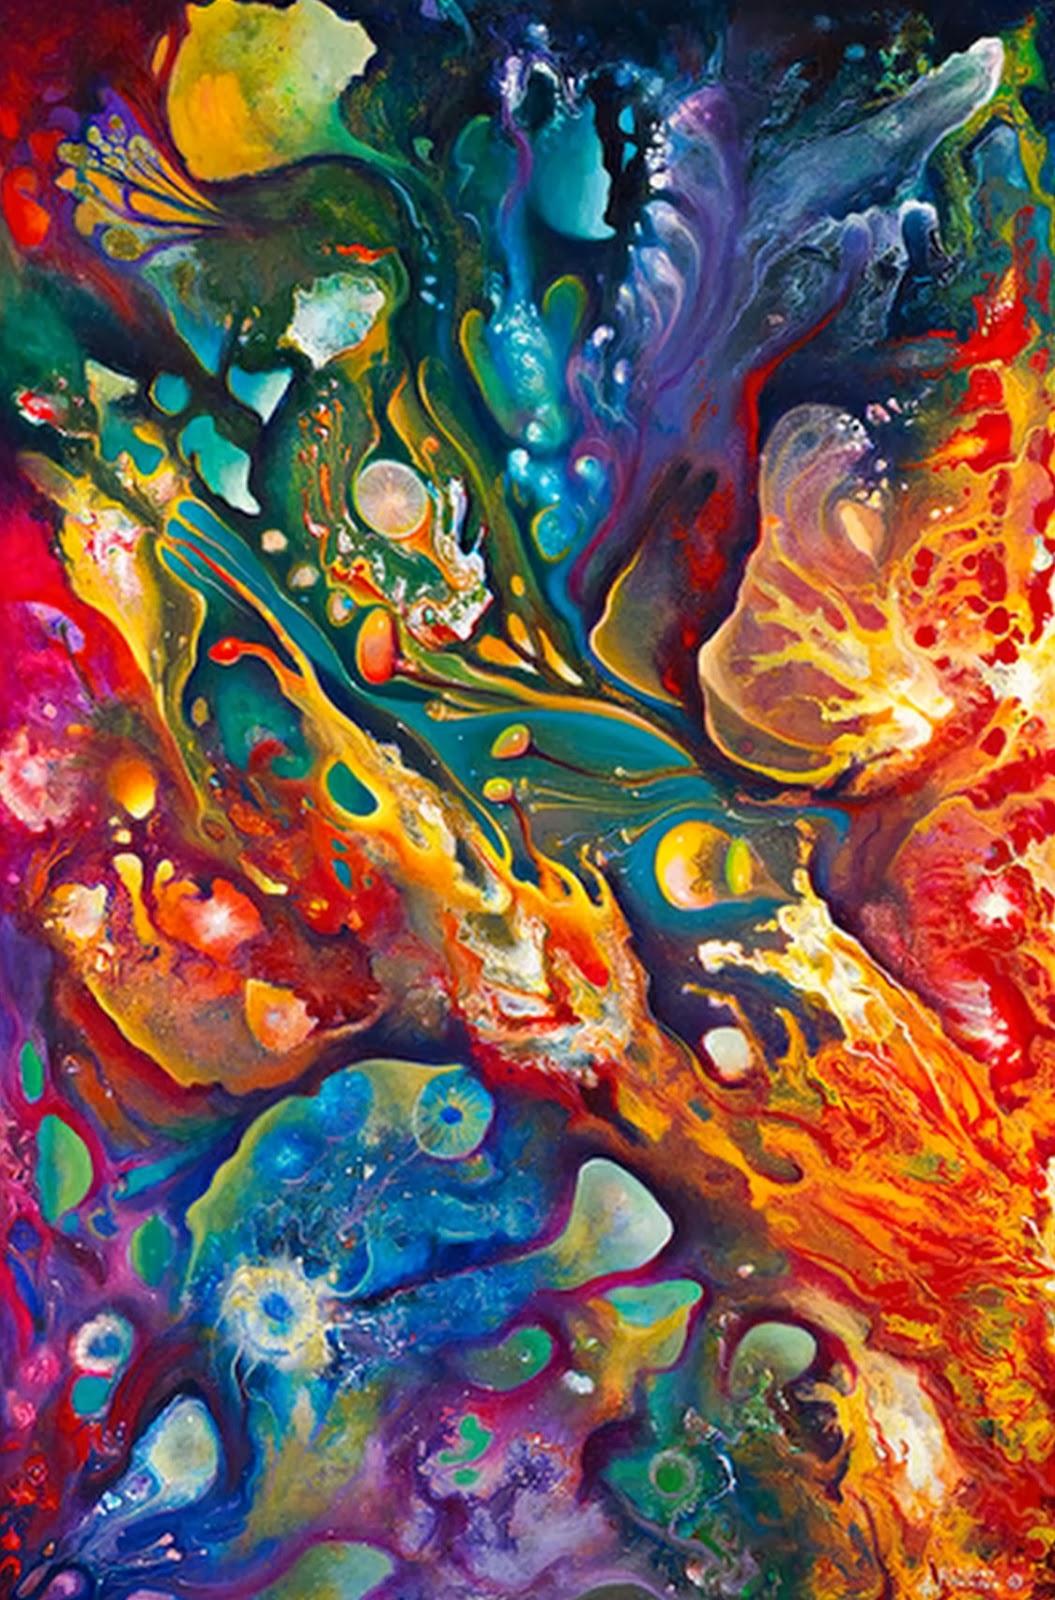 Cuadros pinturas oleos abstractos modernos pinturas de for Pintura para estanques de peces